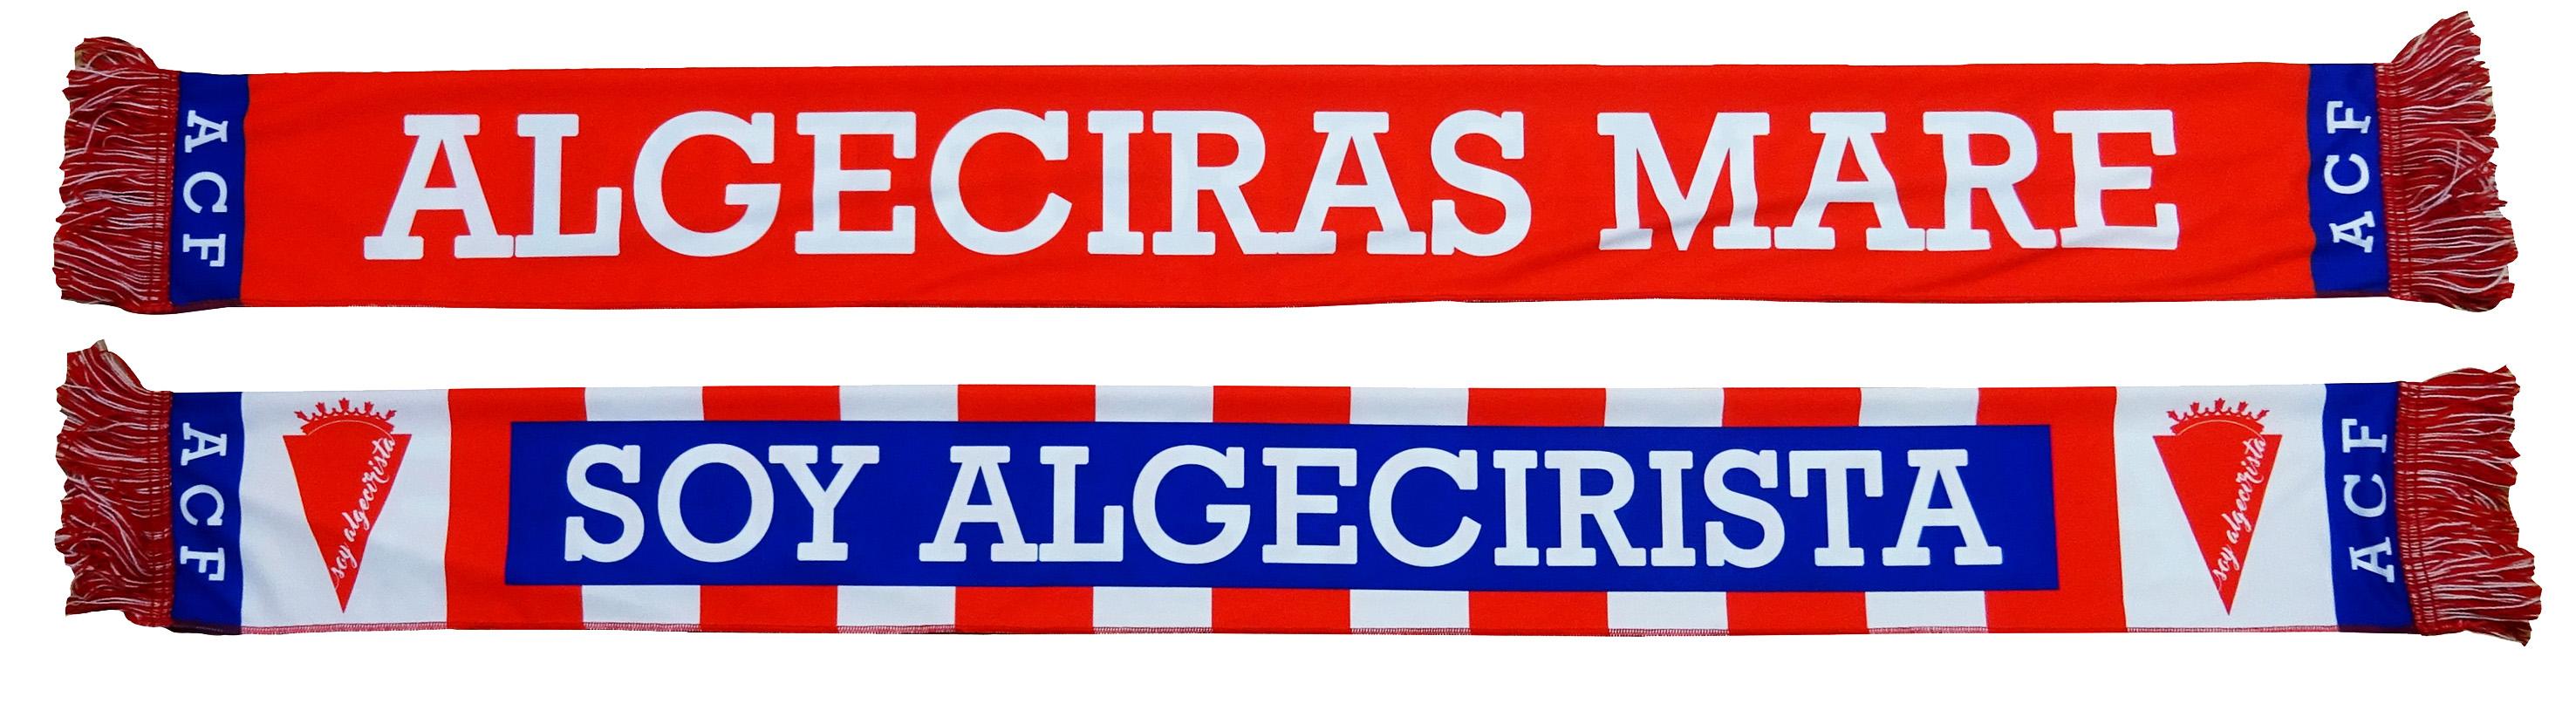 Buf Algeciras Mare